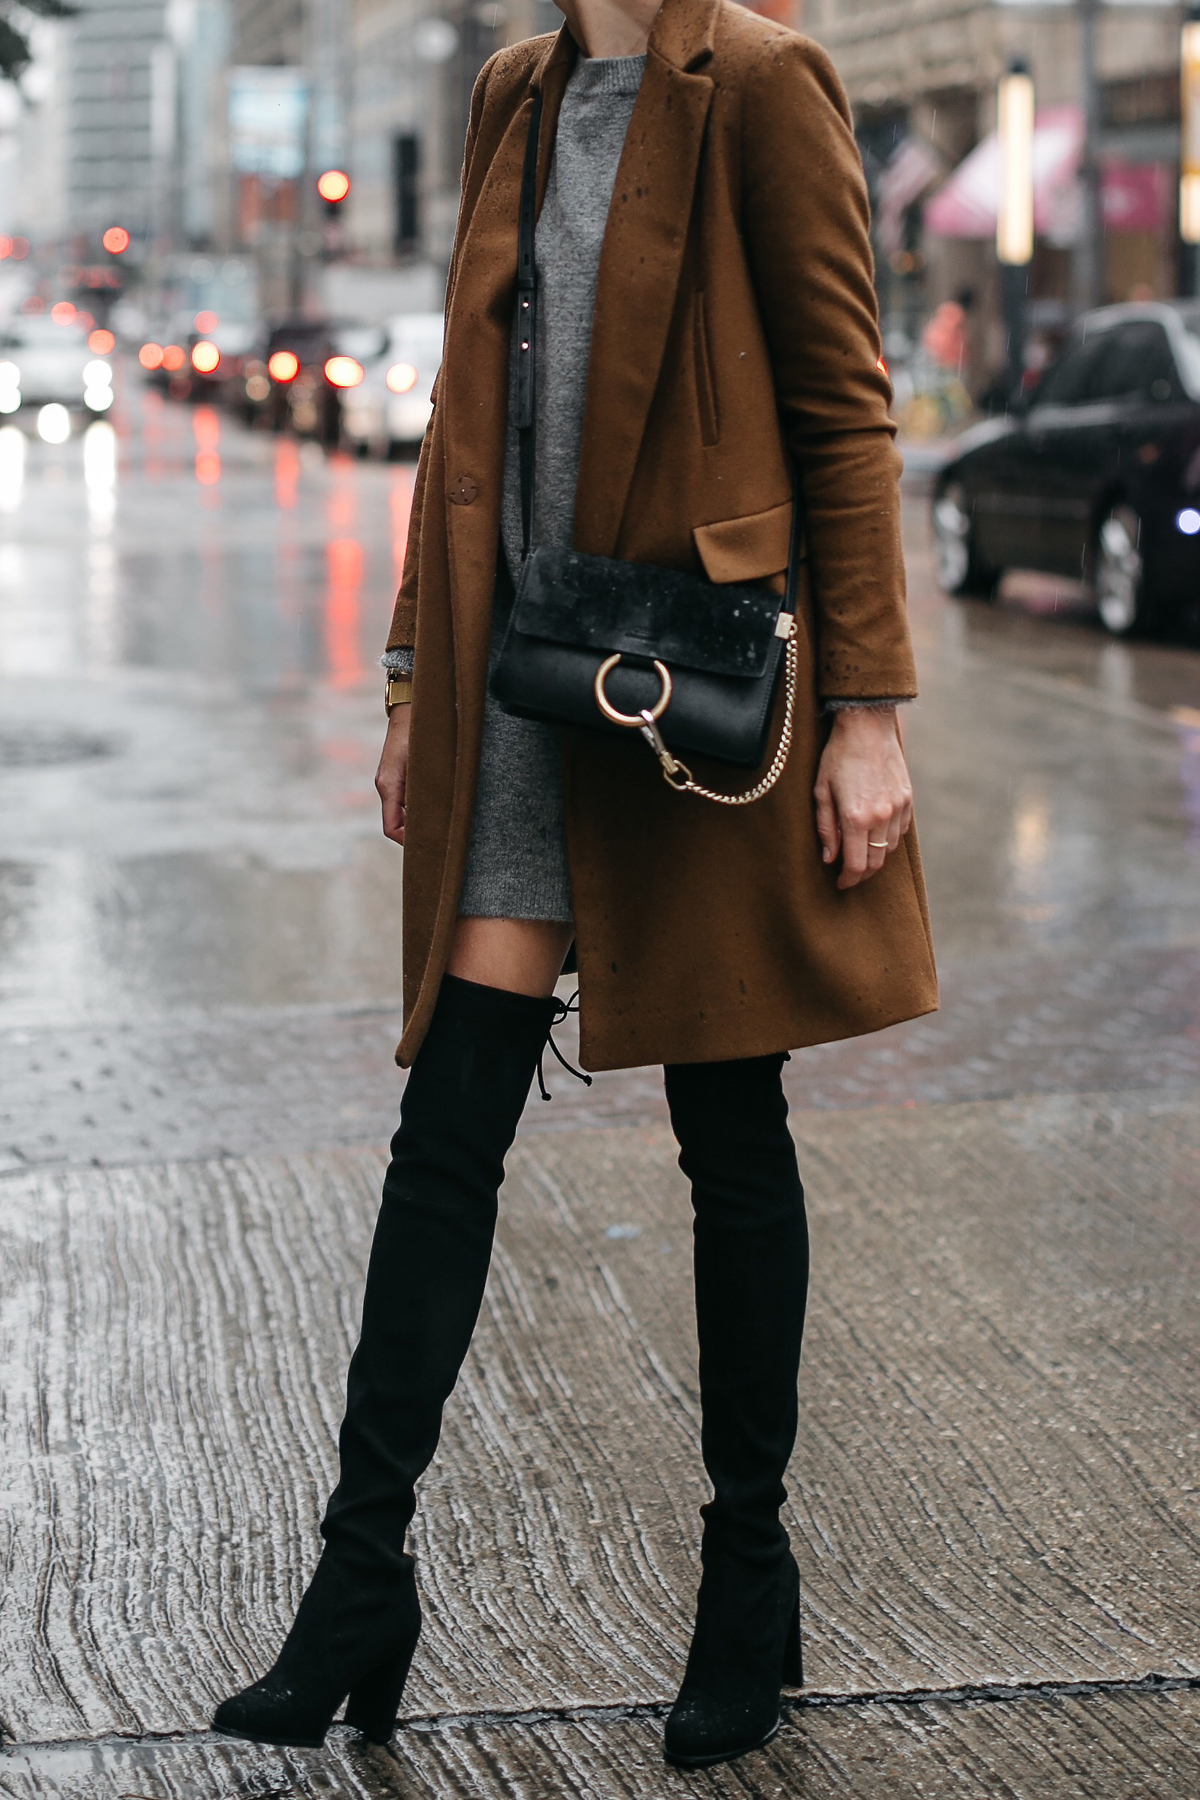 Zara Camel Wool Coat Topshop Grey Sweater Dress Chloe Faye Handbag Stuart Weitzman Black Over the Knee Boots Fashion Jackson Dallas Blogger Fashion Blogger Street Style